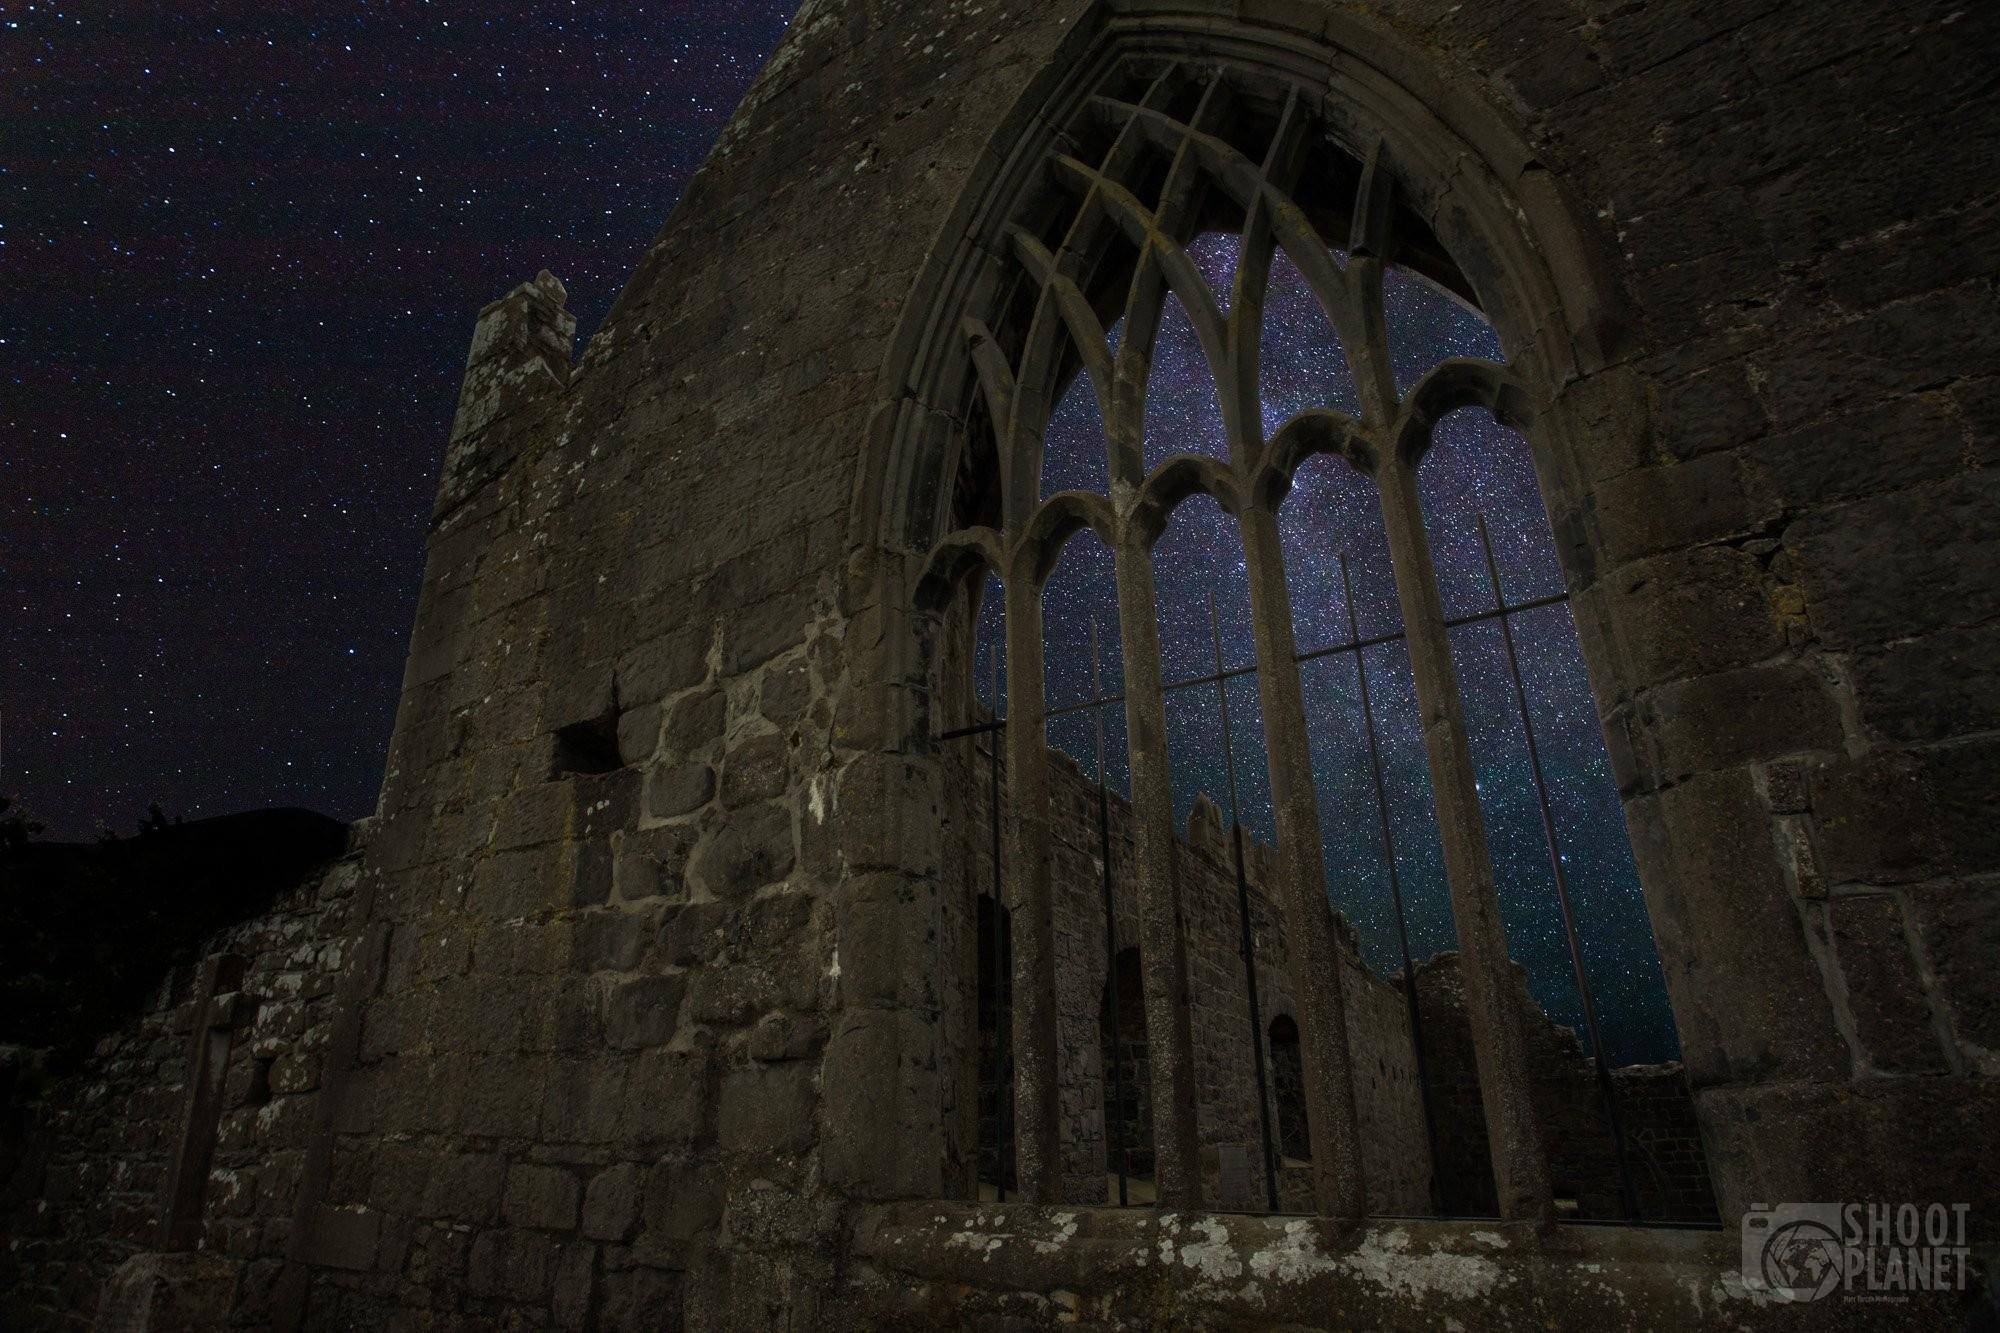 Murrisk Abbey ruins under starry sky, Ireland